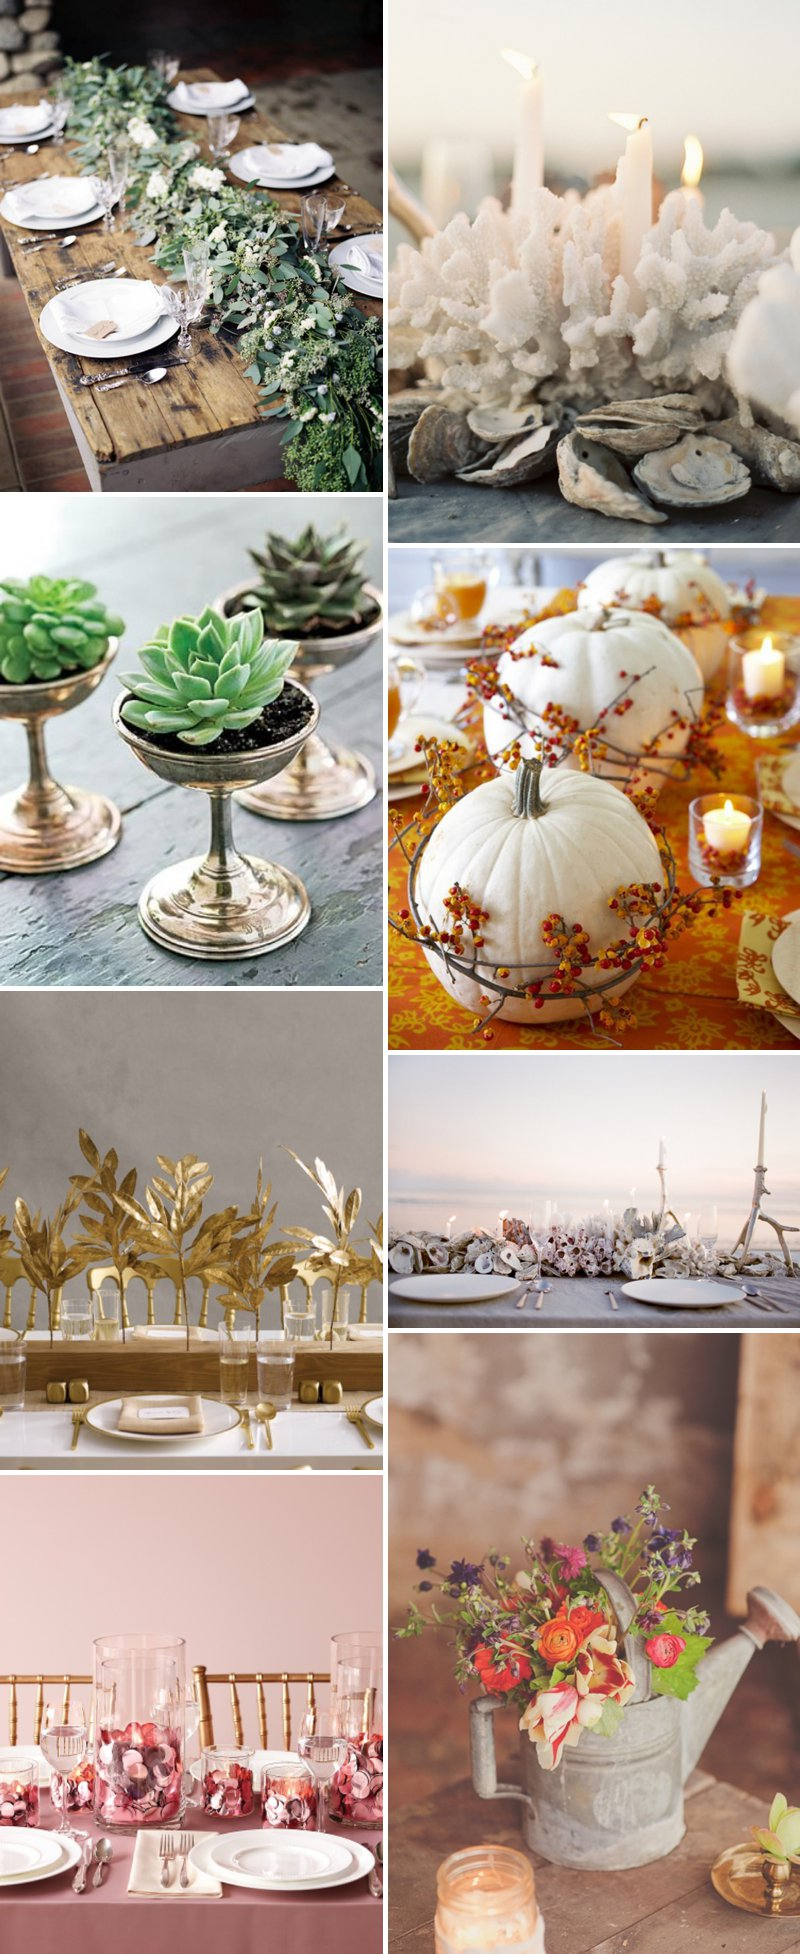 Unusual Wedding Centrepiece Table Centerpiece Pumpkins Succulents Coral Coastal